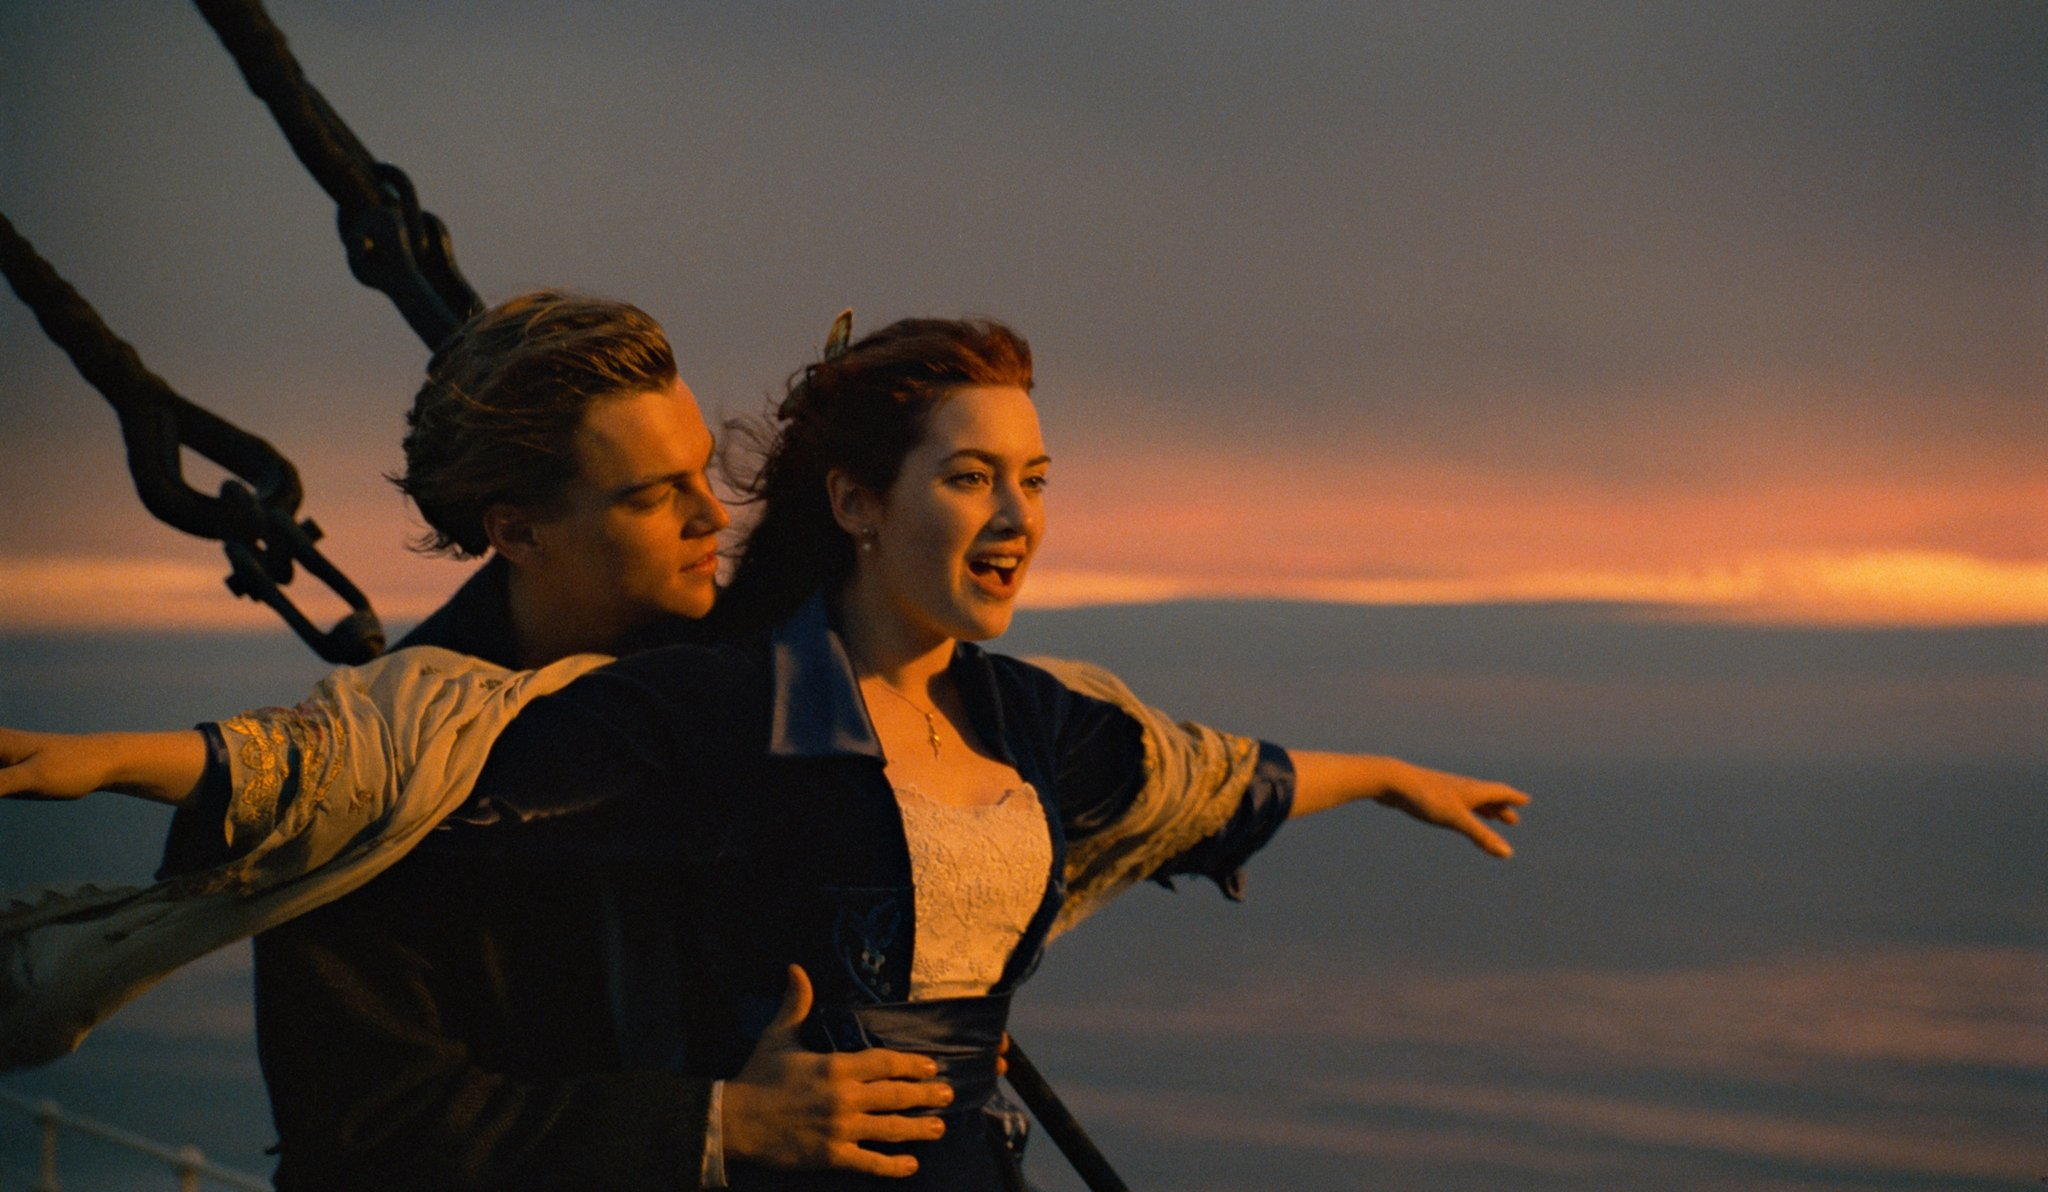 titanic-leonardo-dicaprio-kate-winslet